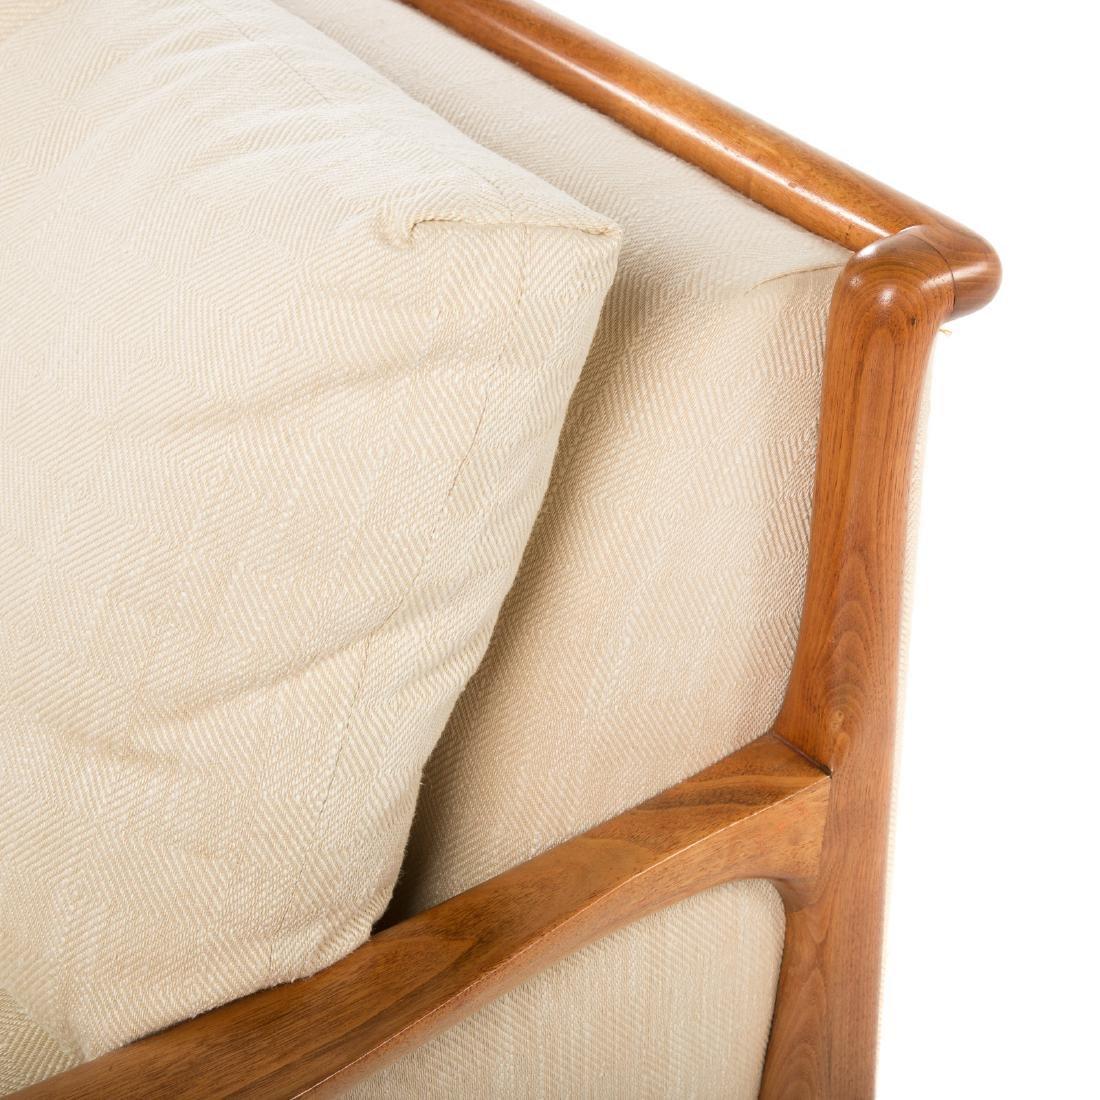 Vladimir Kagan - Dreyfuss walnut upholstered sofa - 6